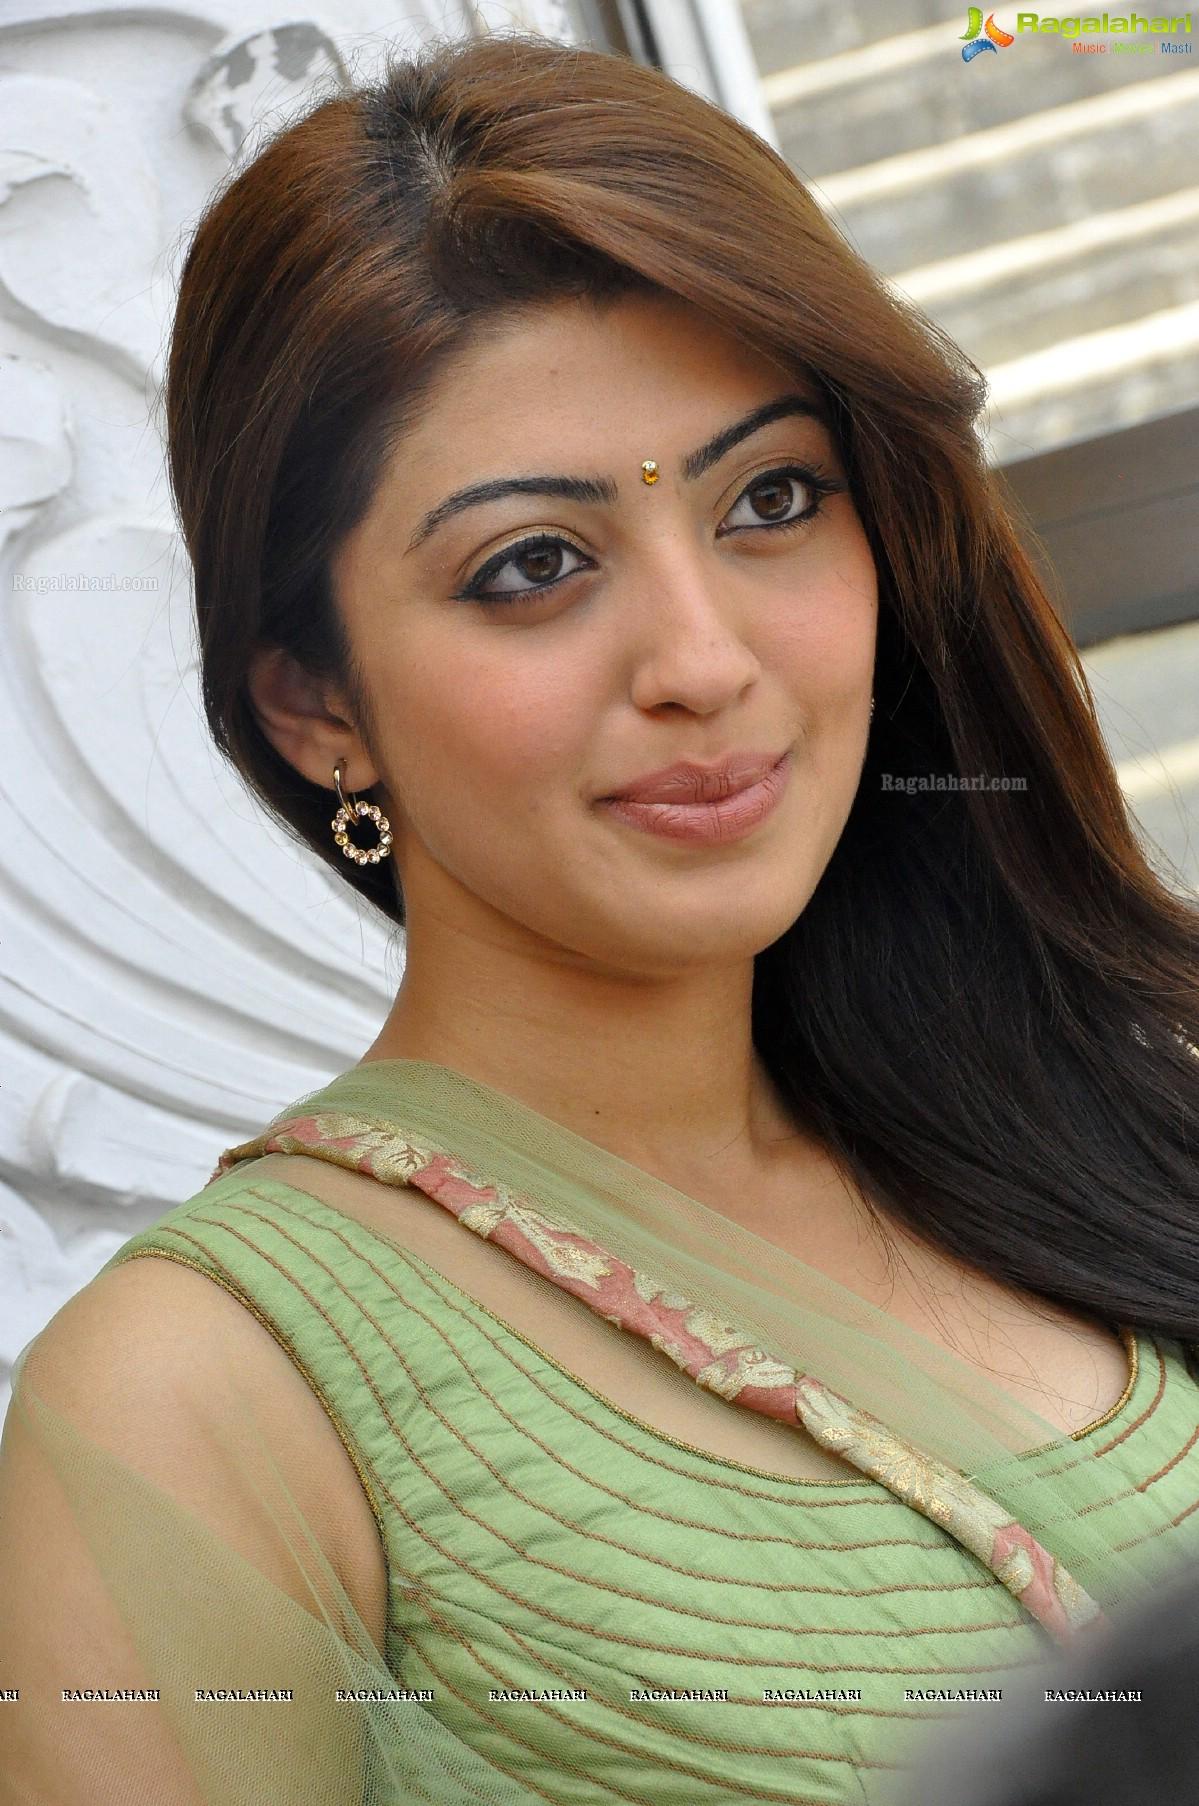 praneetha image 2 tollywood actress wallpapers stills